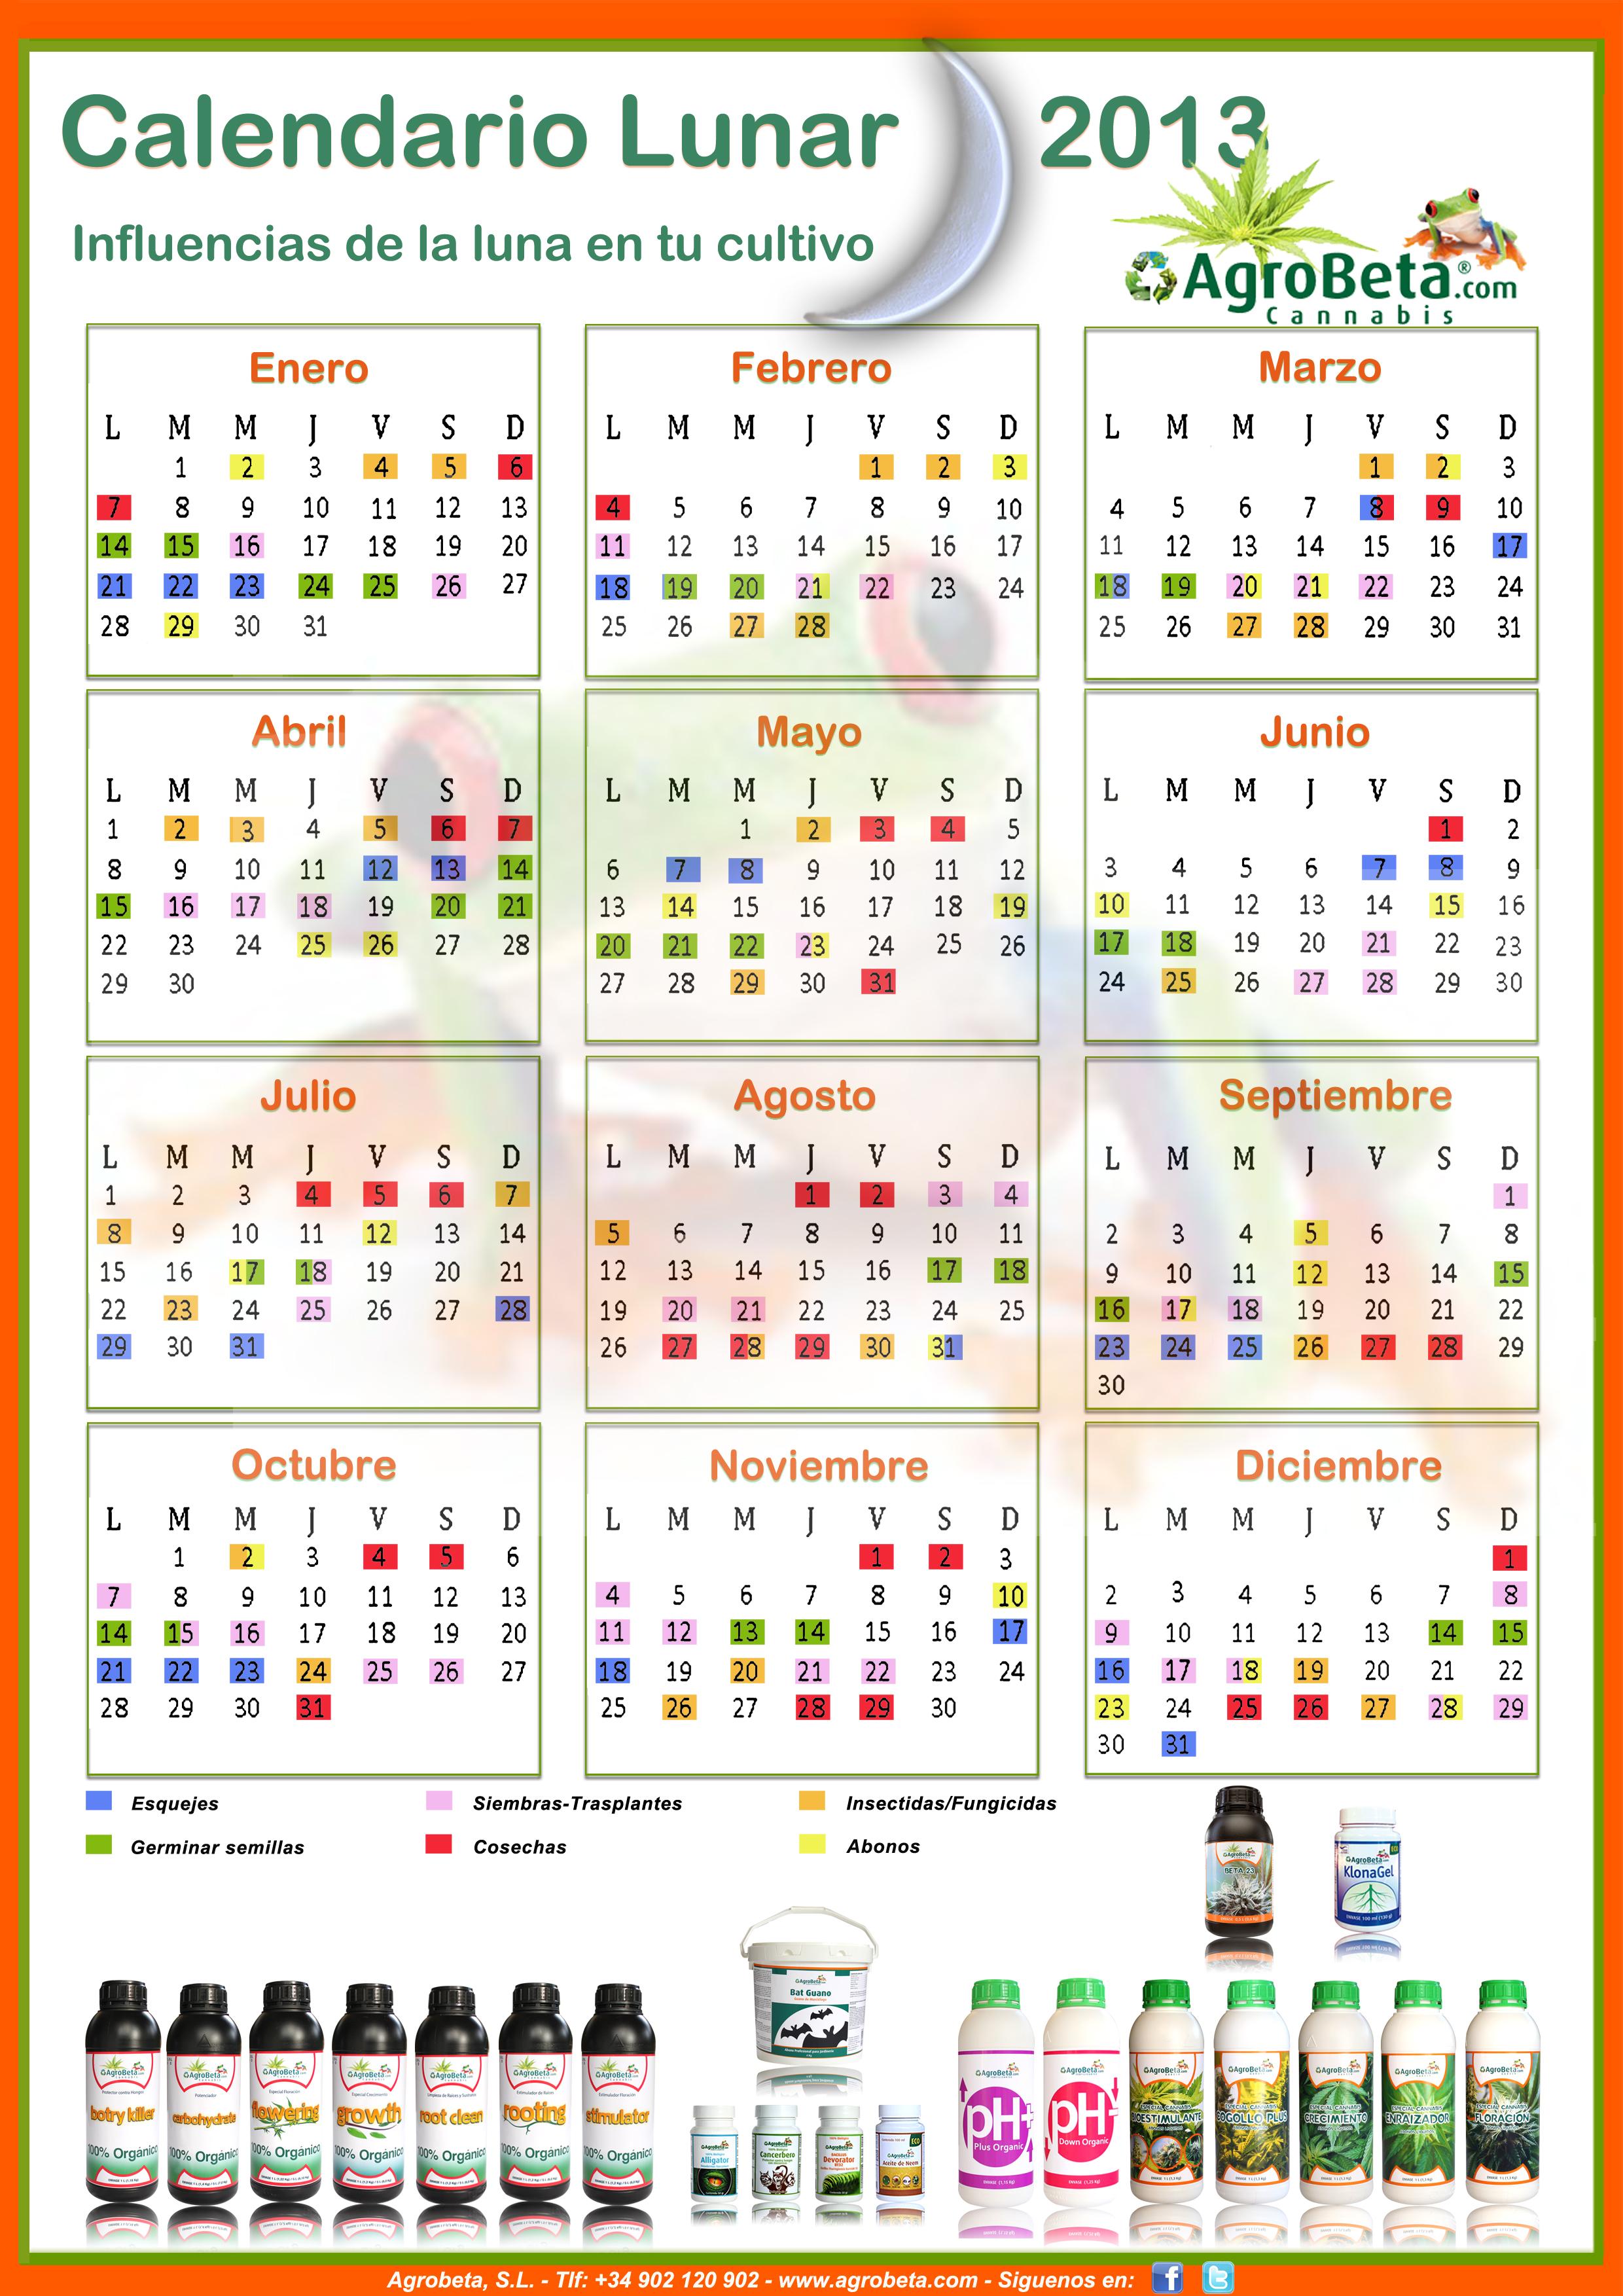 Calendario Lunar Año 2013 para cannabis | Blog de AGROBETA.com